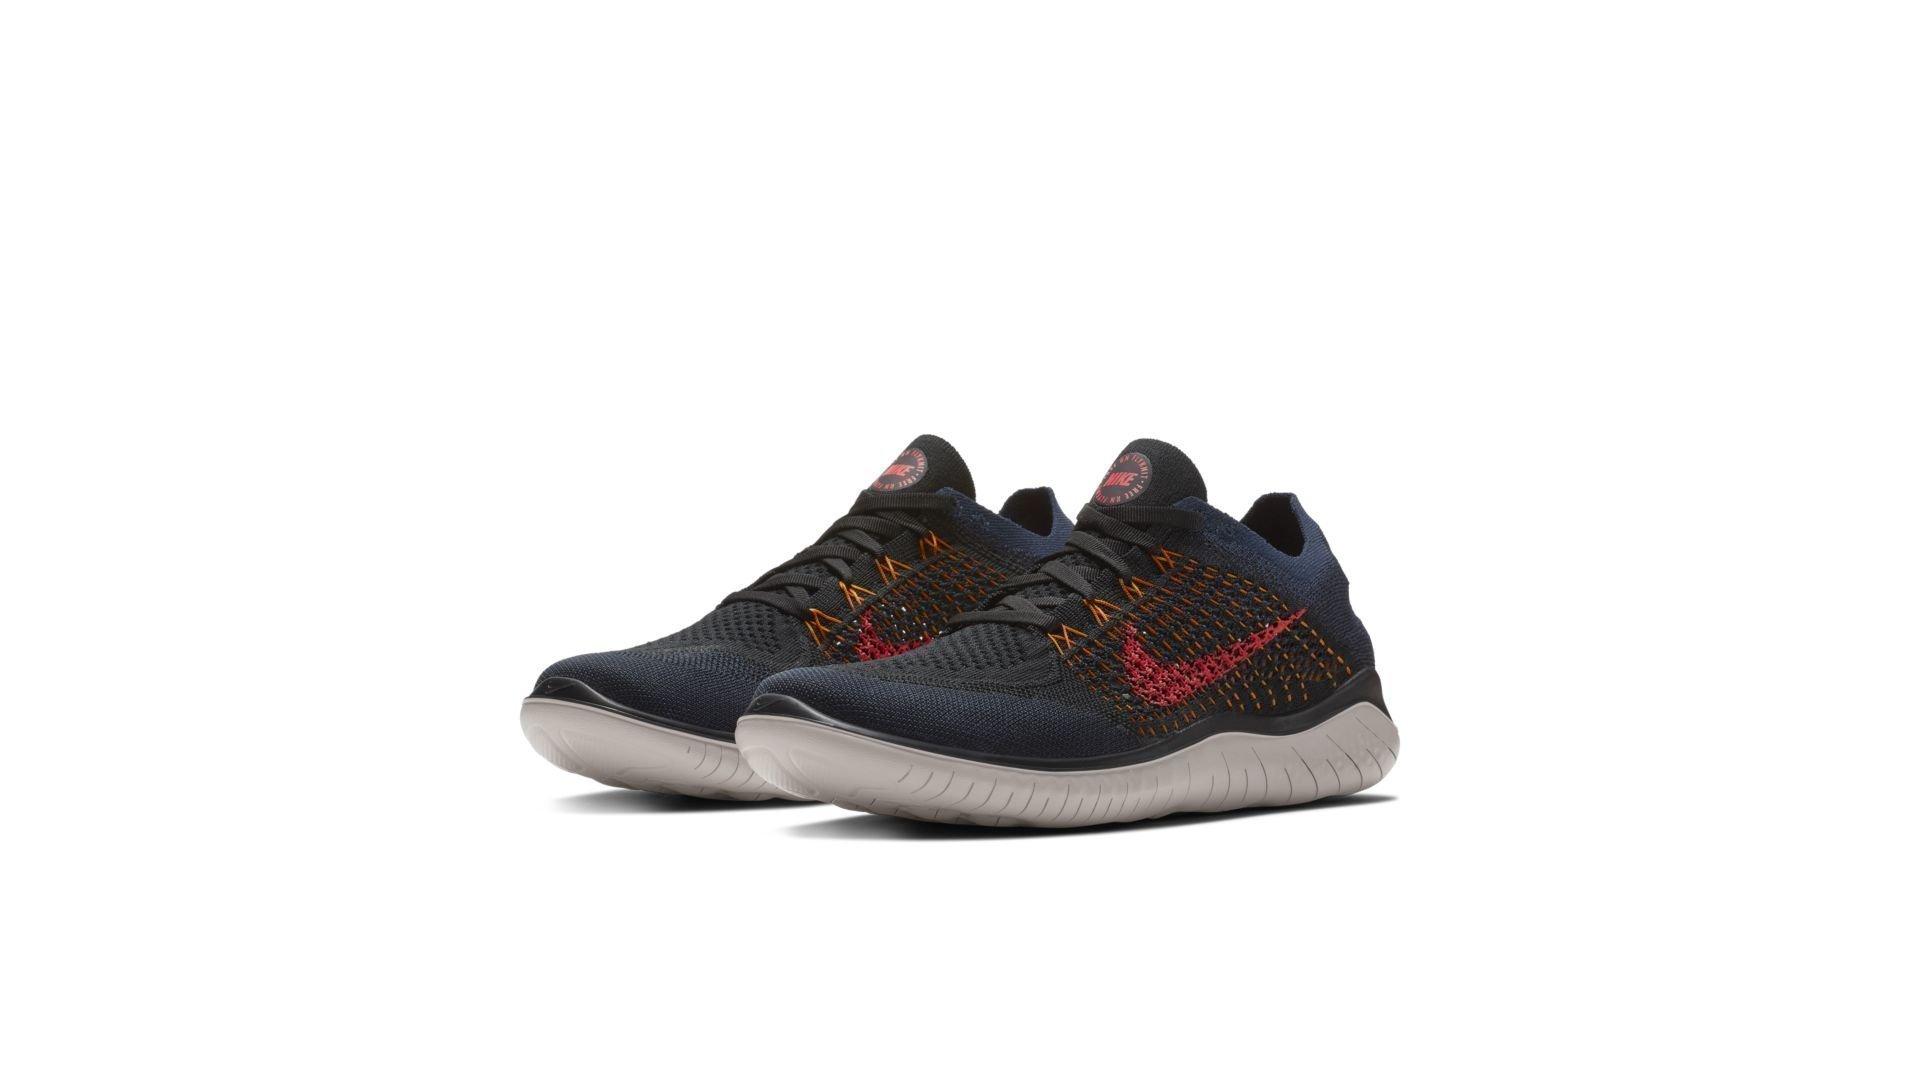 Nike Free RN Flyknit 2018 Black Flash Crimson Orange Peel (942838-068)